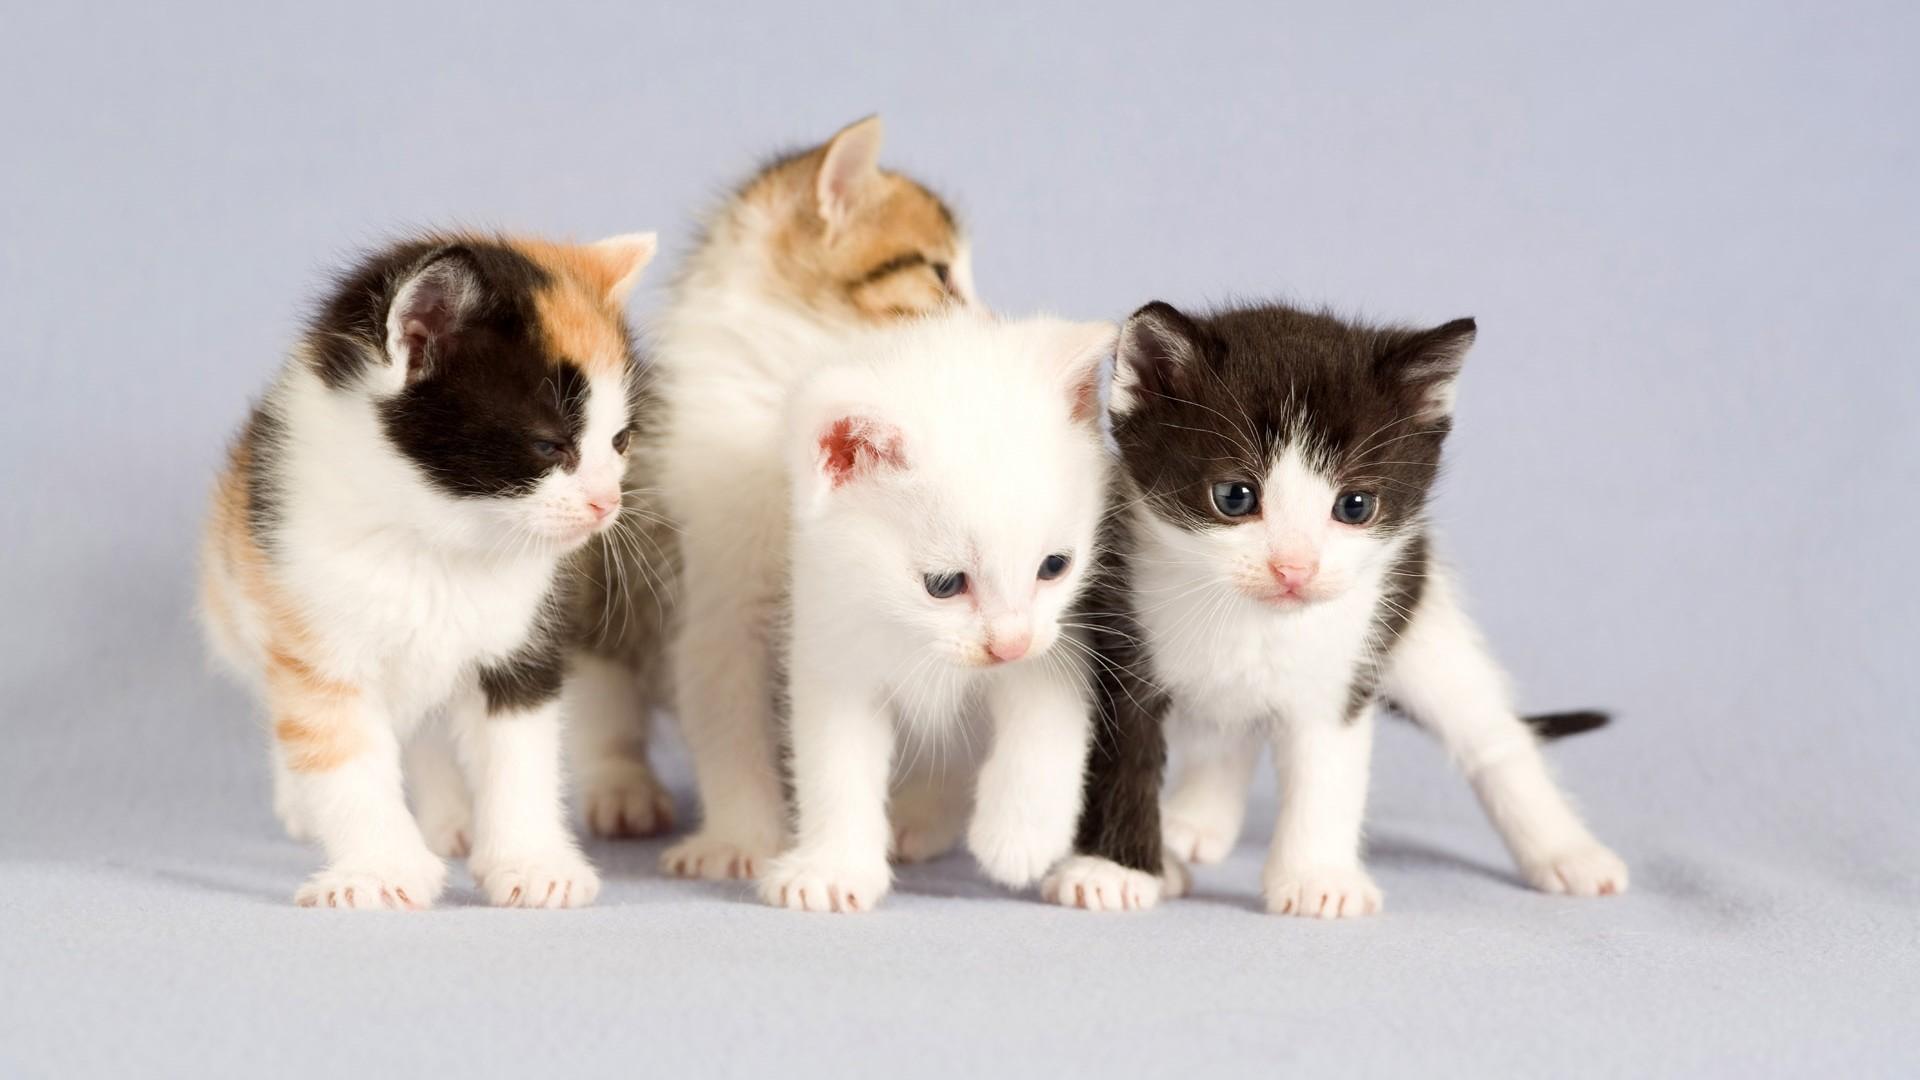 Cute Dog and Cat Wallpaper | PixelsTalk.Net | Epic Car Wallpapers |  Pinterest | Cat wallpaper, Wallpaper and Hd wallpaper